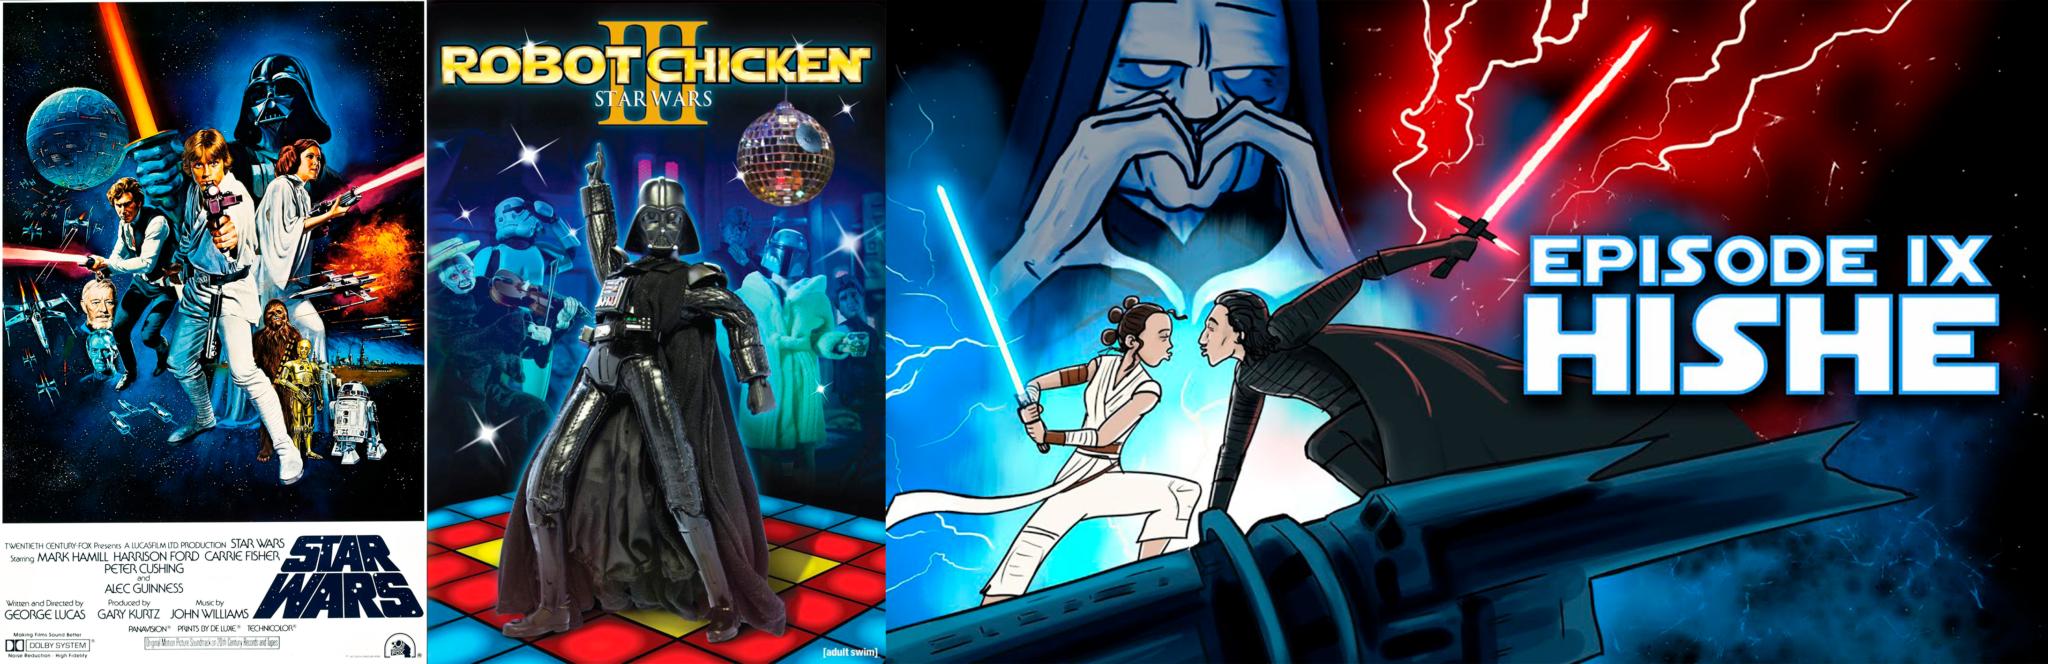 Star Wars parody: Robot Chicken and Hishe - thescriptblog.com